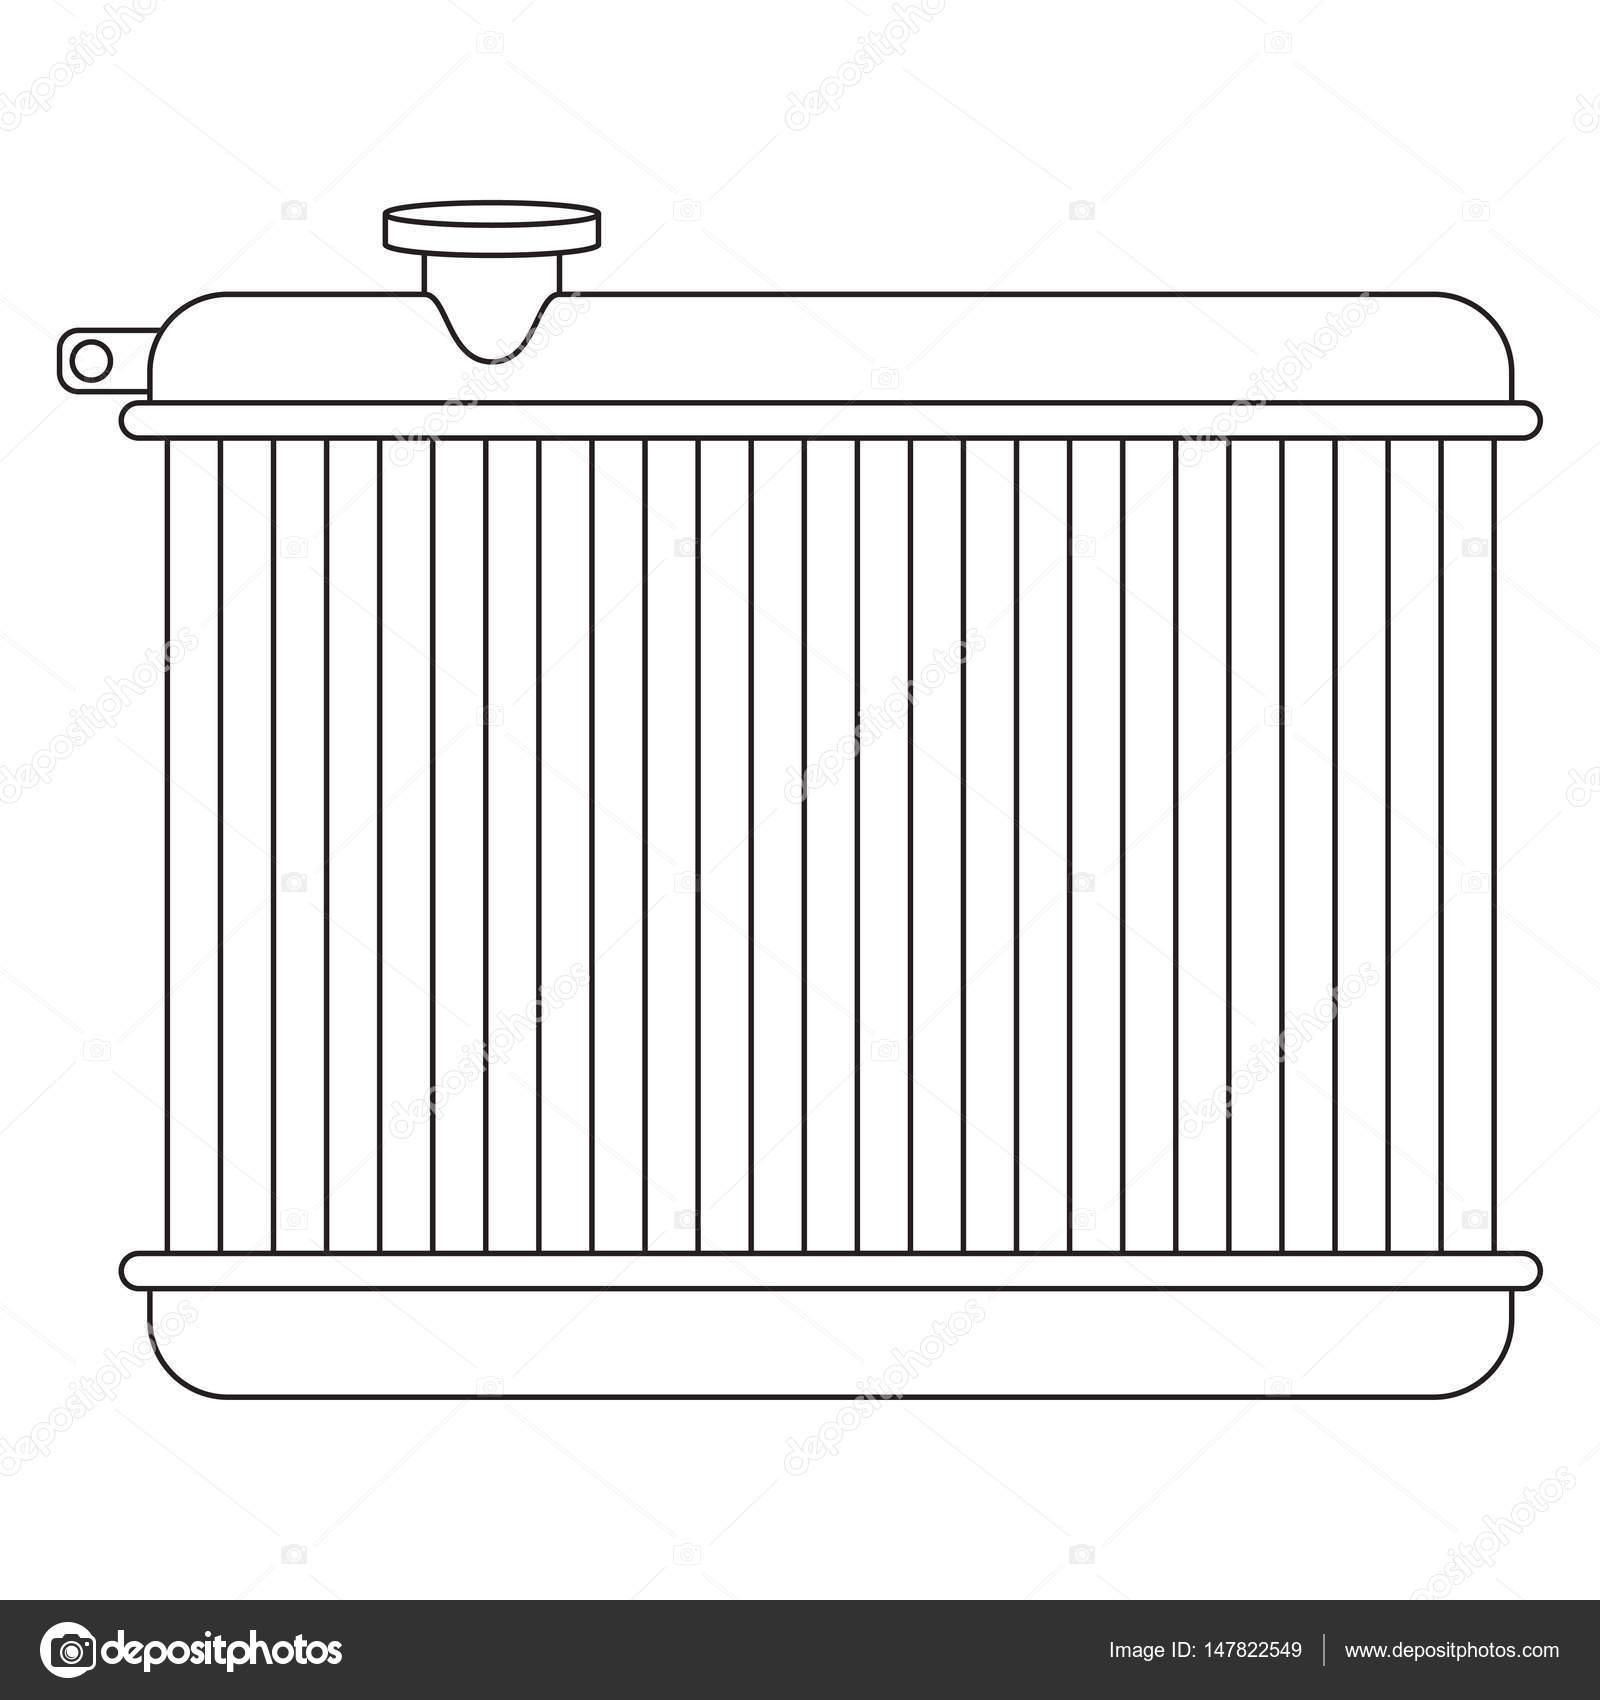 Car radiator line drawing stock vector vectorielle for Radiador dwg